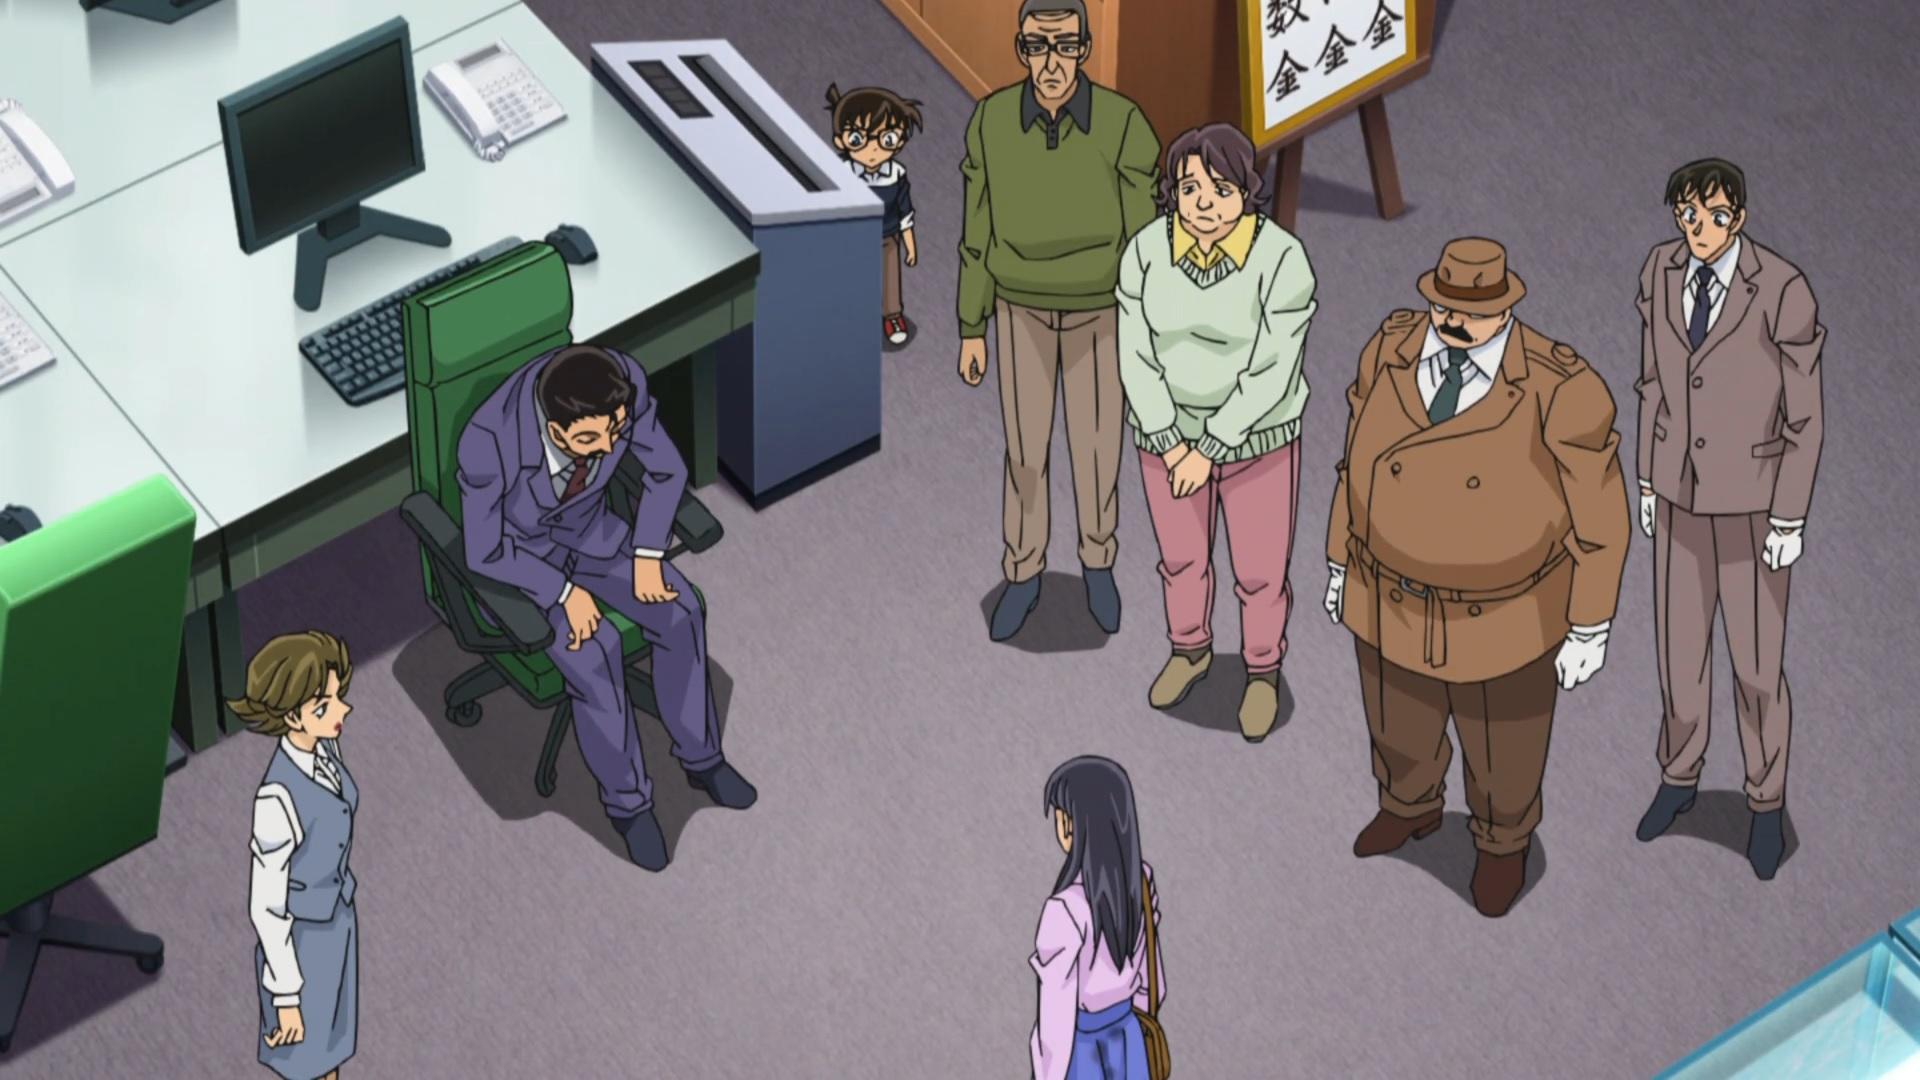 Detektiv-Conan-Episode-977-3